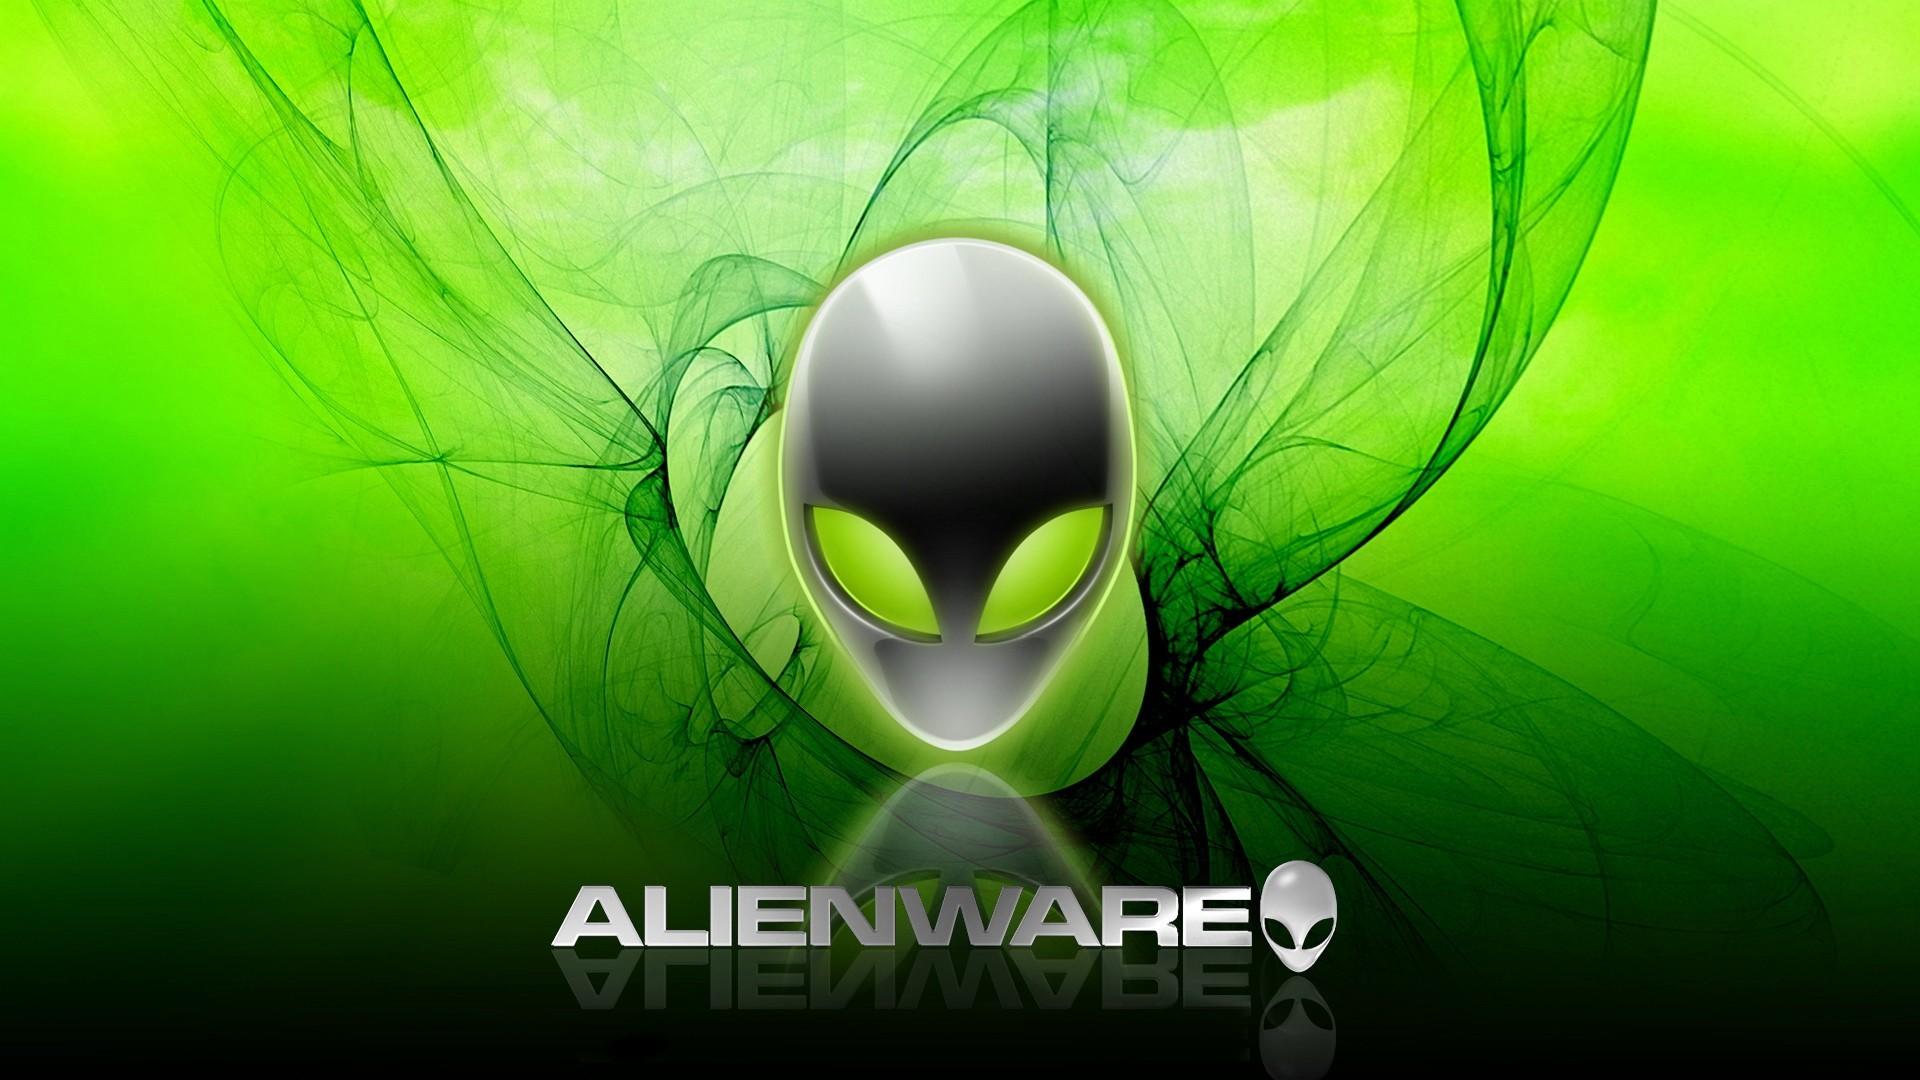 alienware backgrounds desktop smoke wallpaper green alien 1920x1080